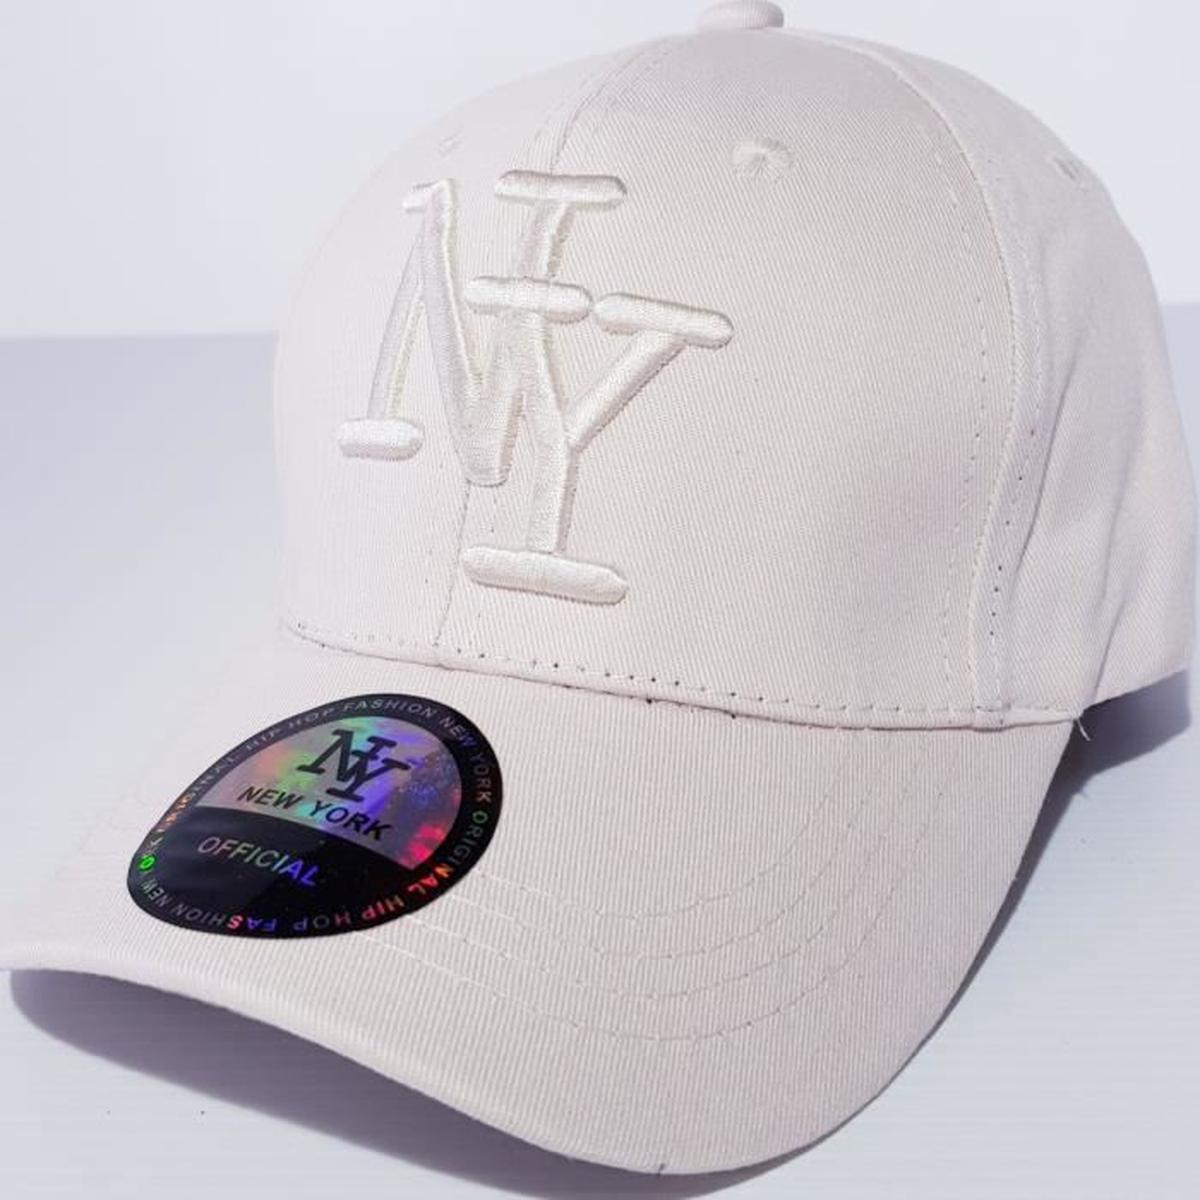 Une casquette de baseball de la marque NY